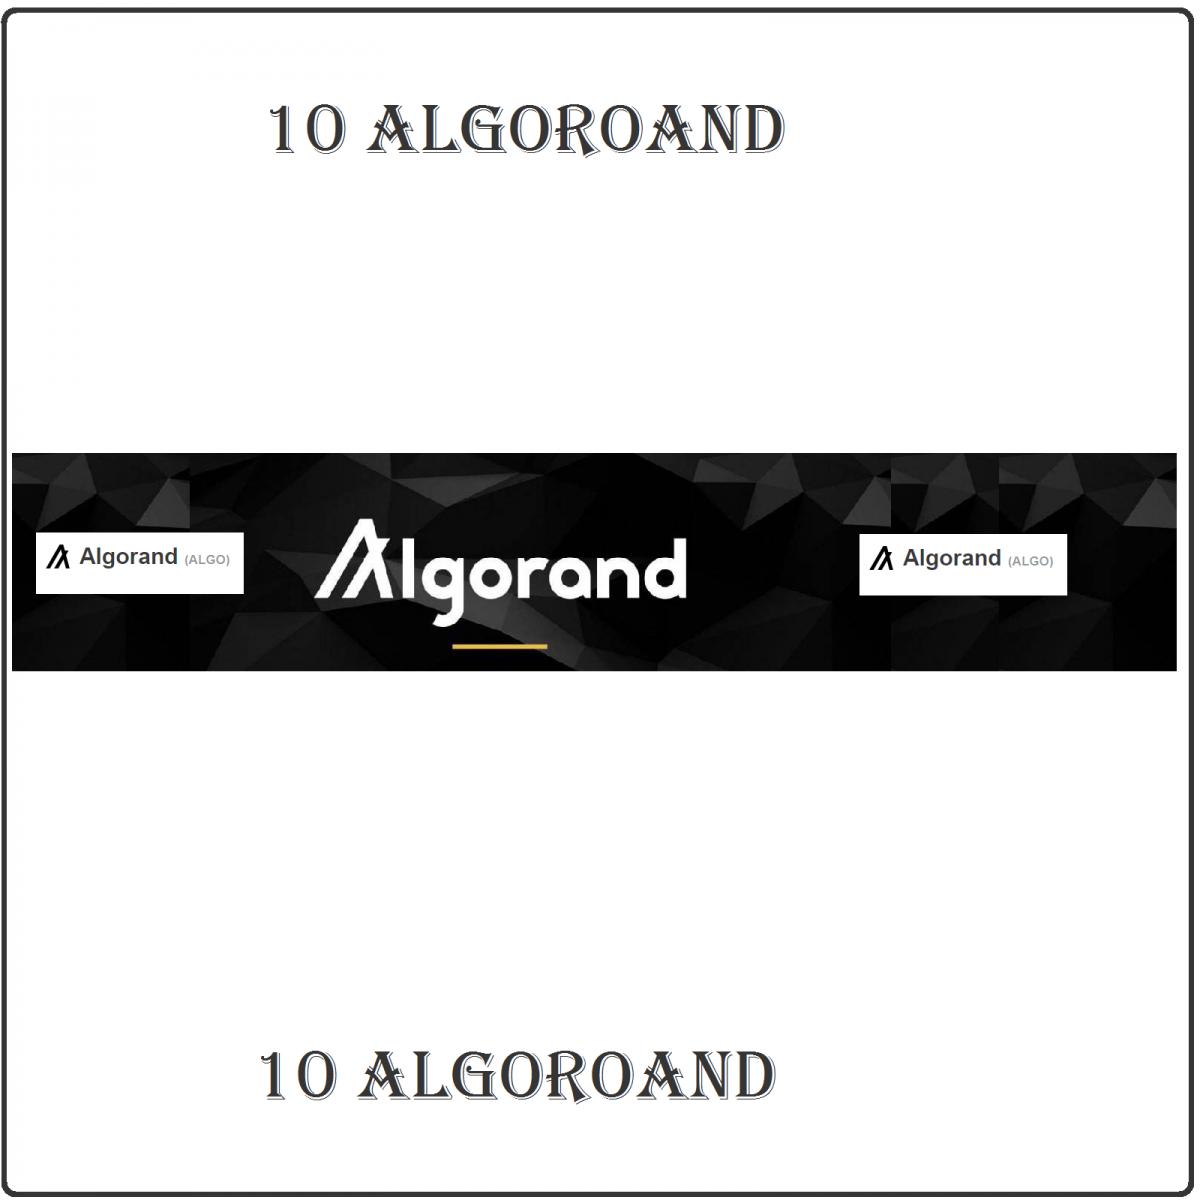 ALGO Service (10 ALGO)